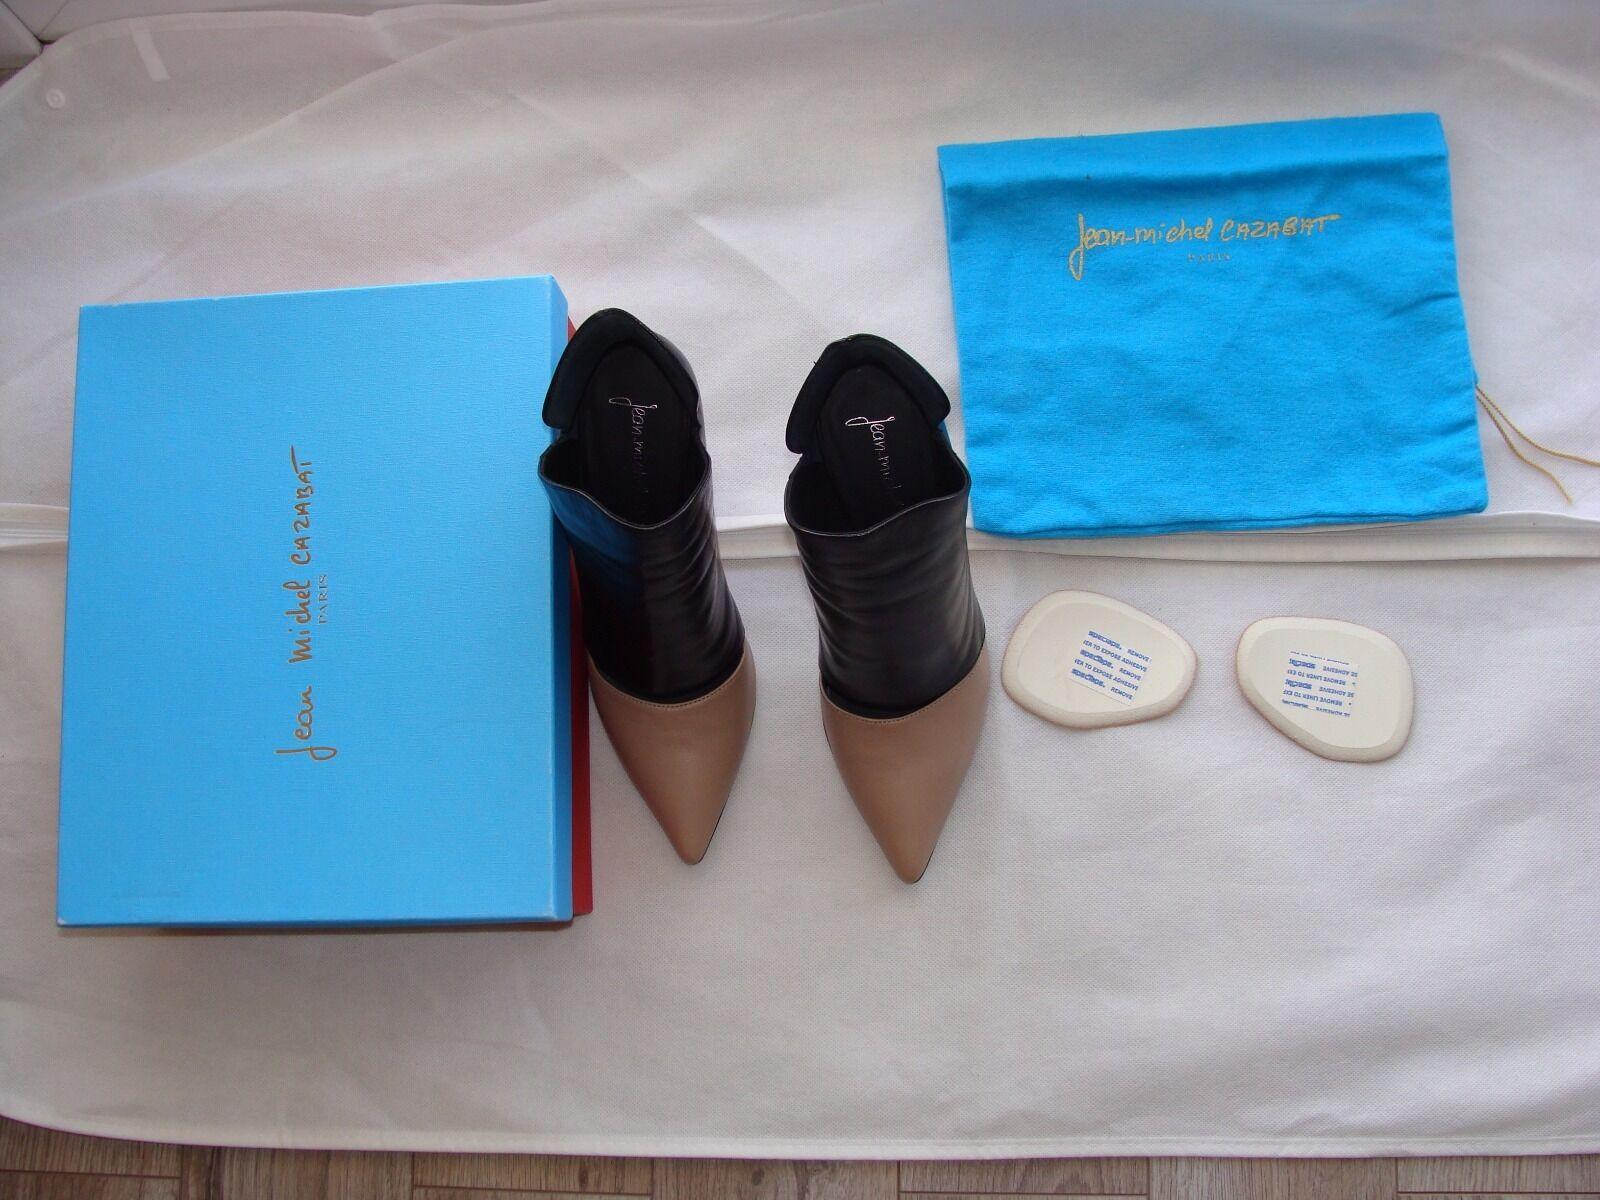 NEW  -JEAN MICHELL CAZABAT Due pelli in pelle avvioie High Heels Dimensione EU 37.5  US 7  2  a prezzi accessibili